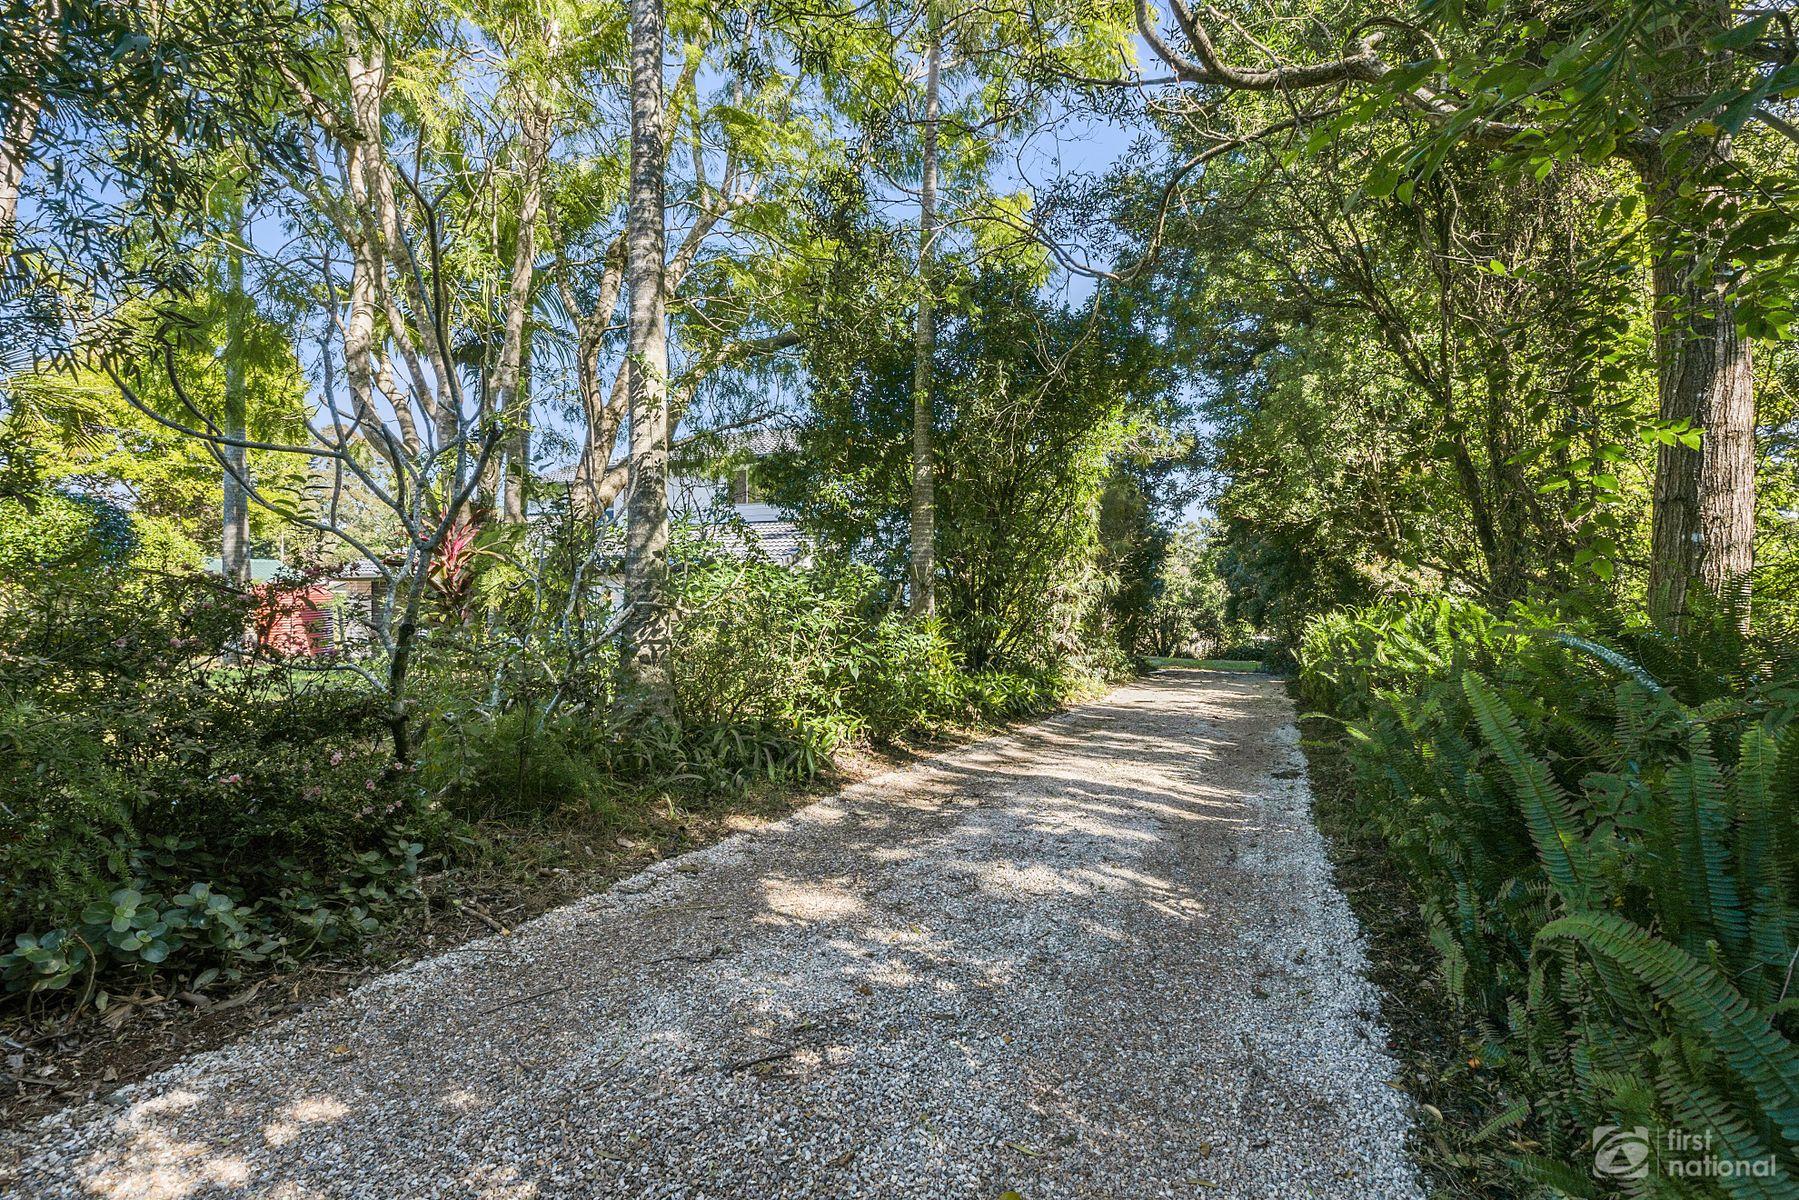 62-64 Sierra Drive, Tamborine Mountain, QLD 4272